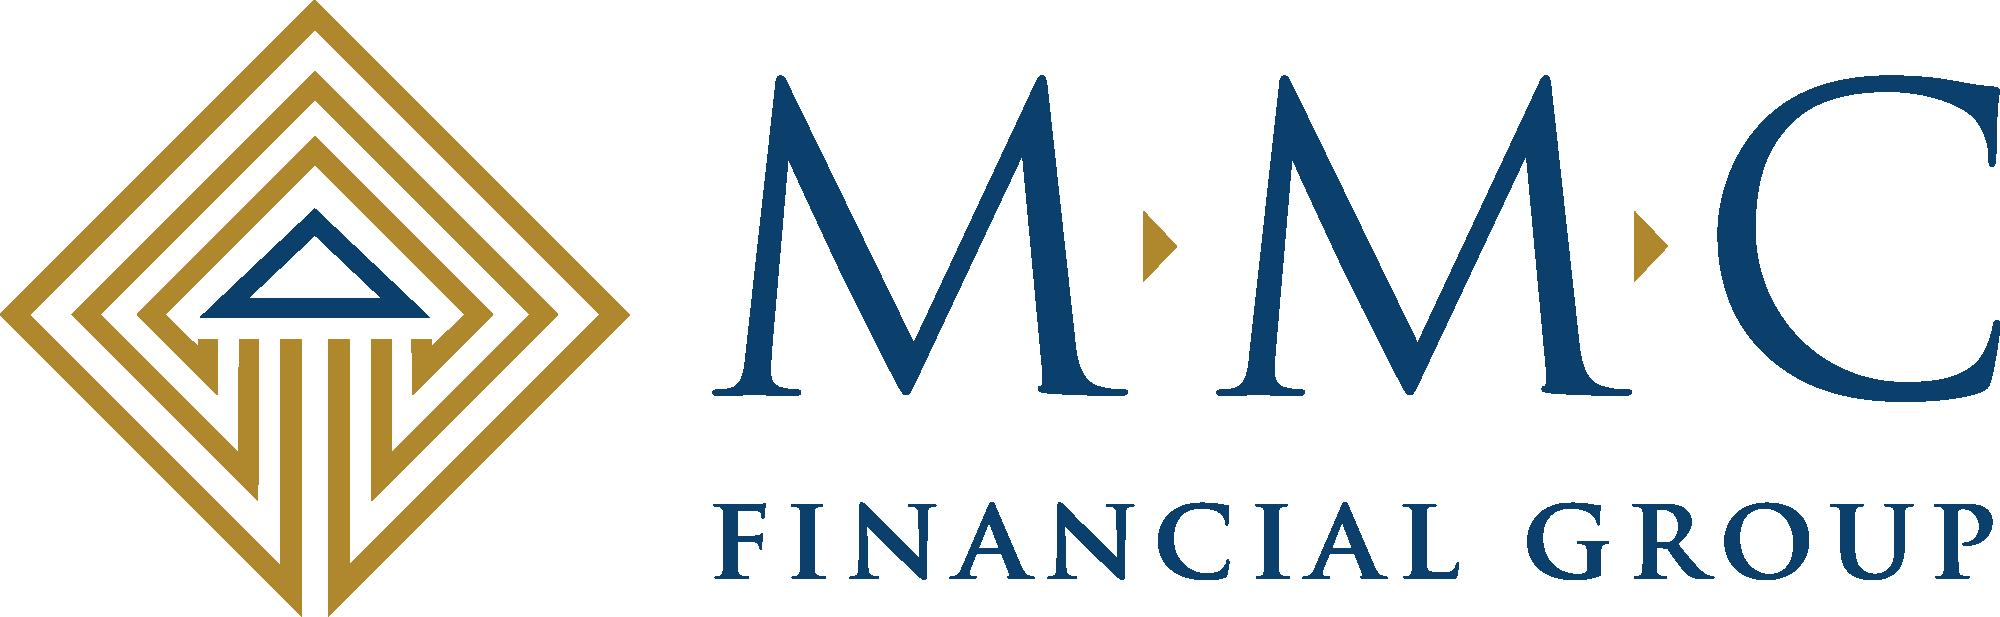 MMC Financial Group